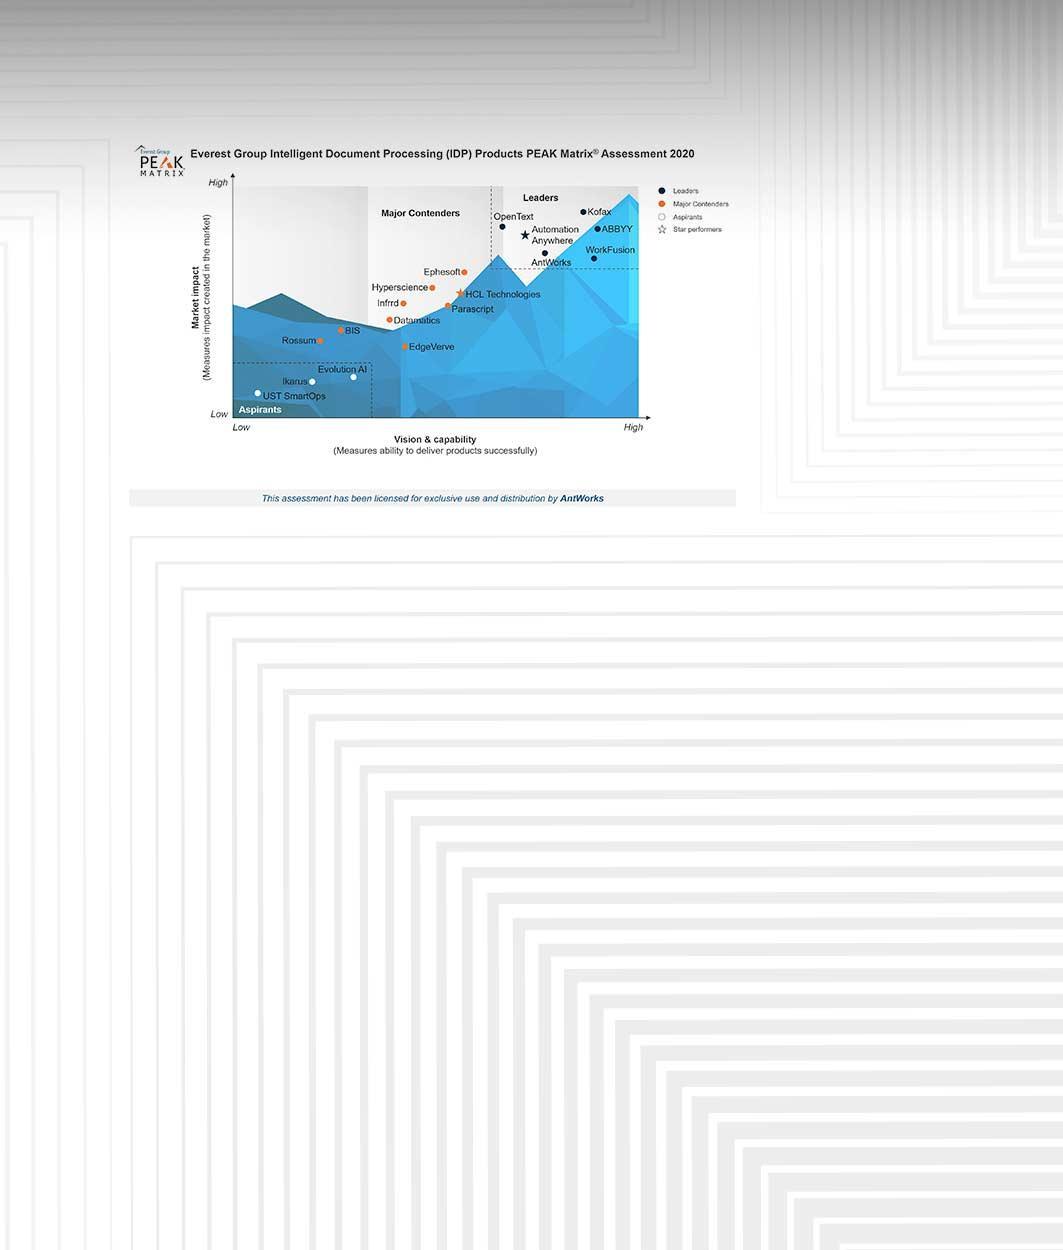 Everest Group's IDP Peak Matrix Report